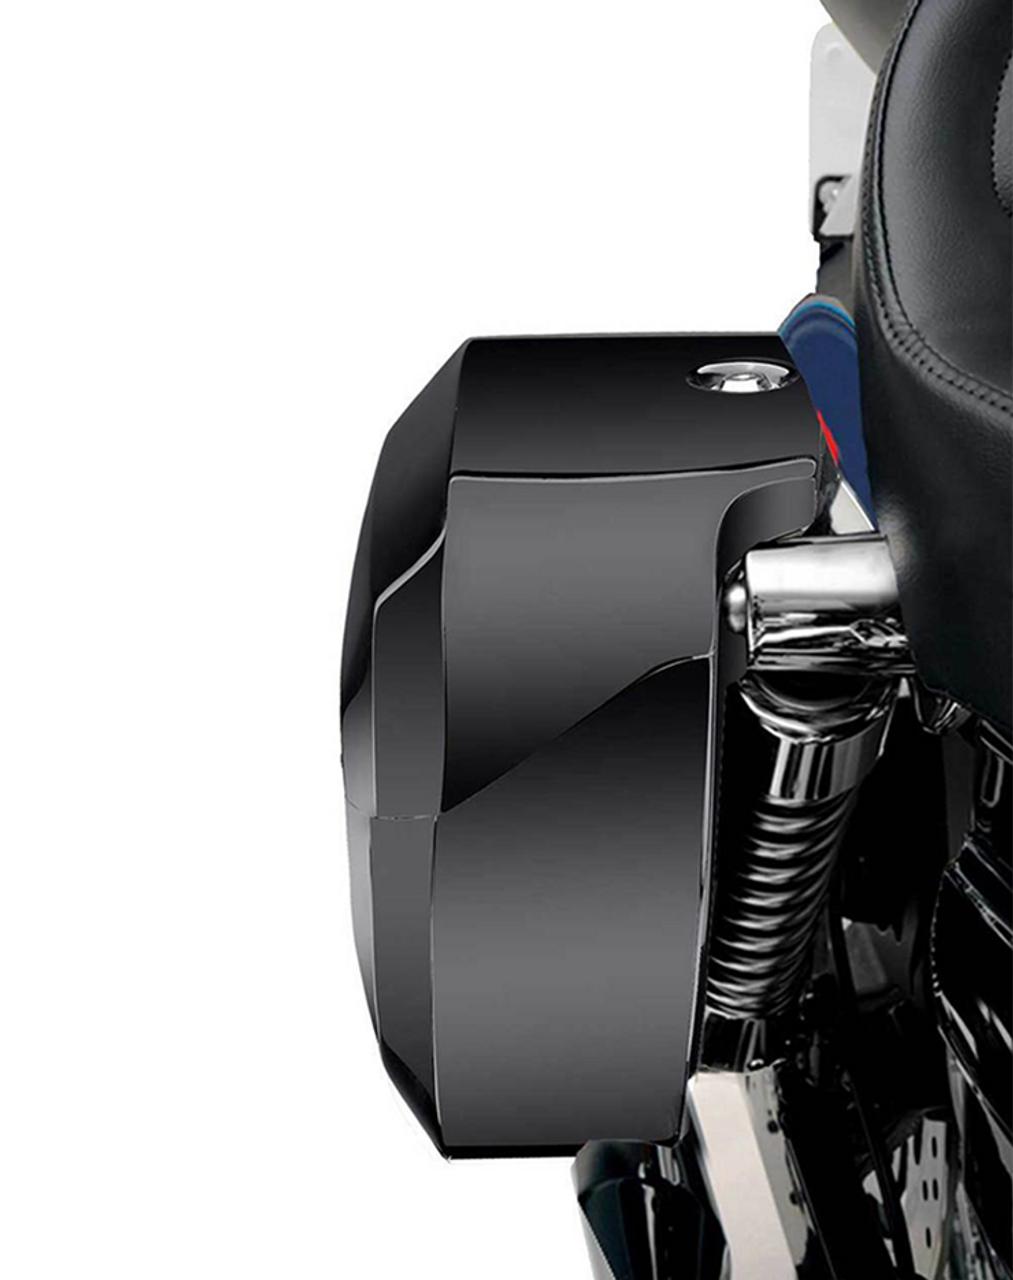 Viking Lamellar Extra Large Shock Cutout Saddlebag For Harley Dyna Street Bob FXDB Shock Cutout View